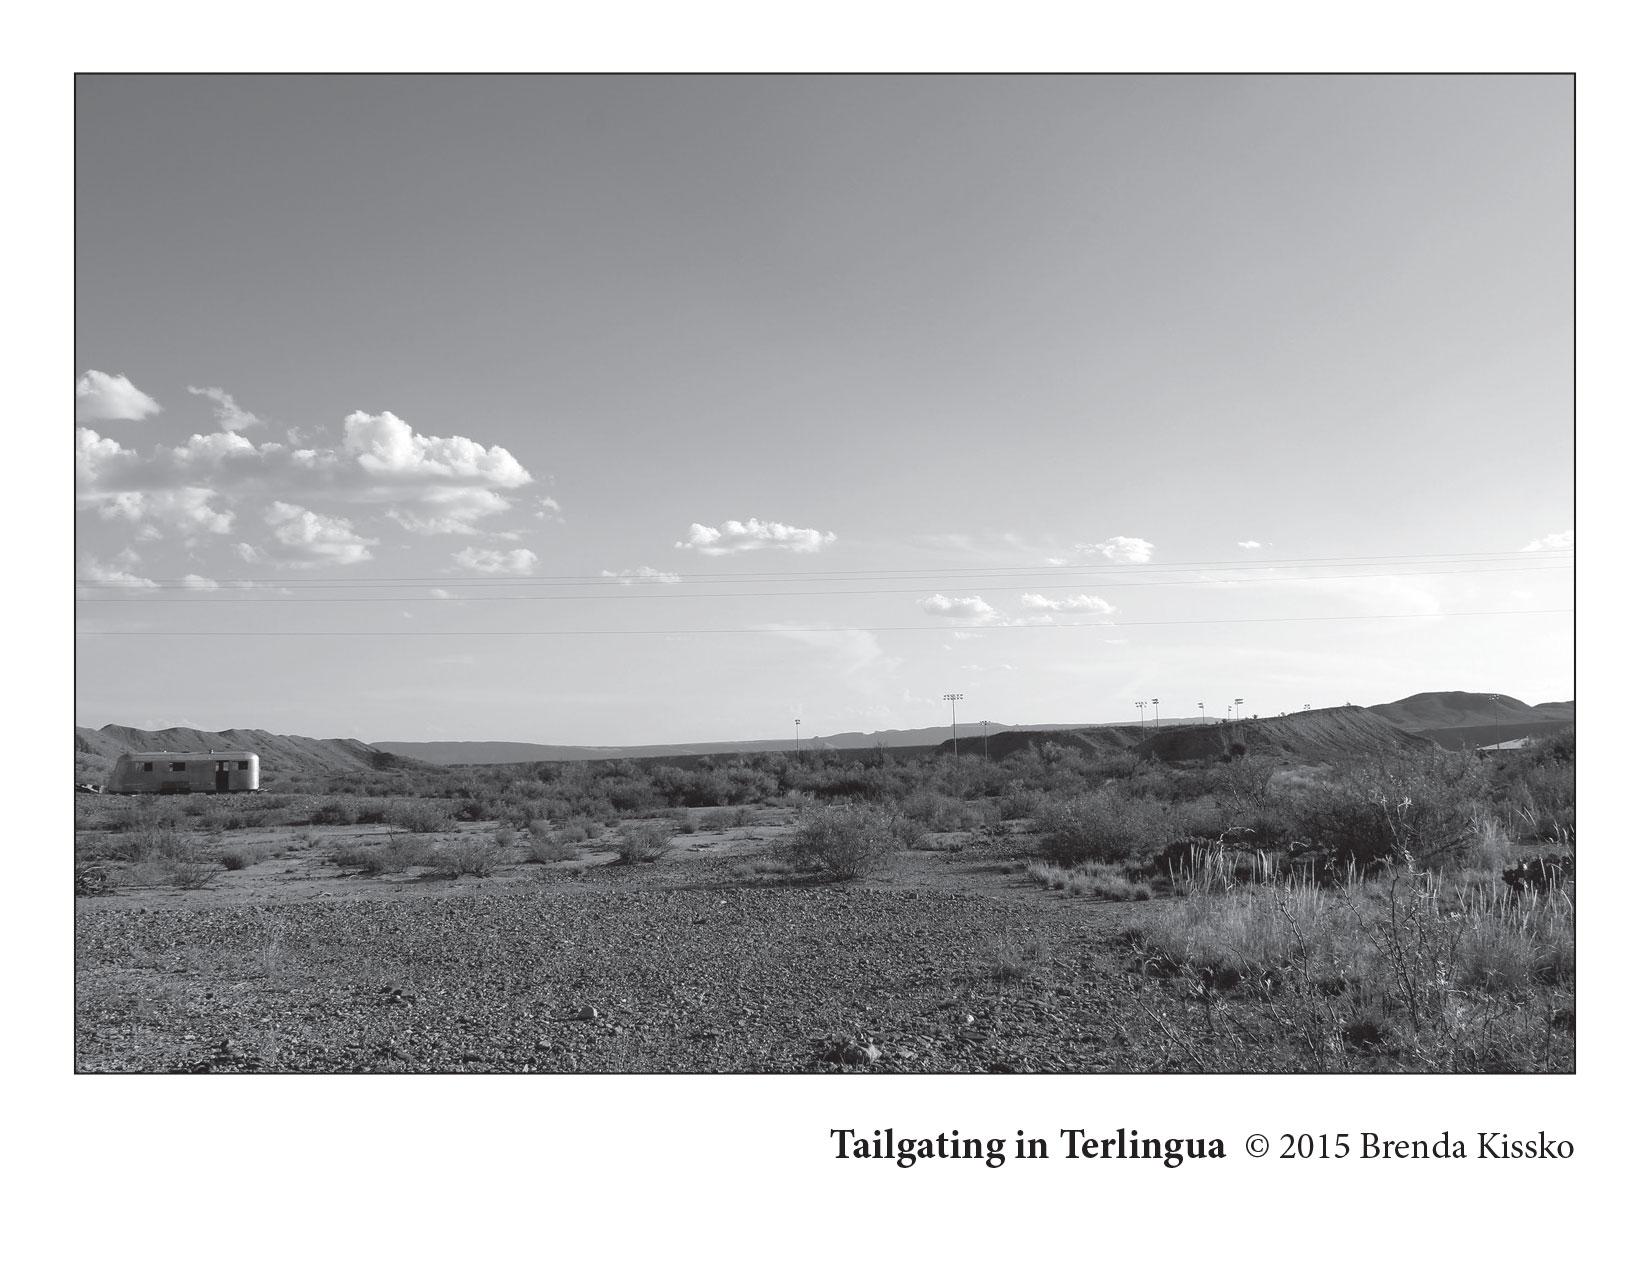 Tailgating in Terlingua